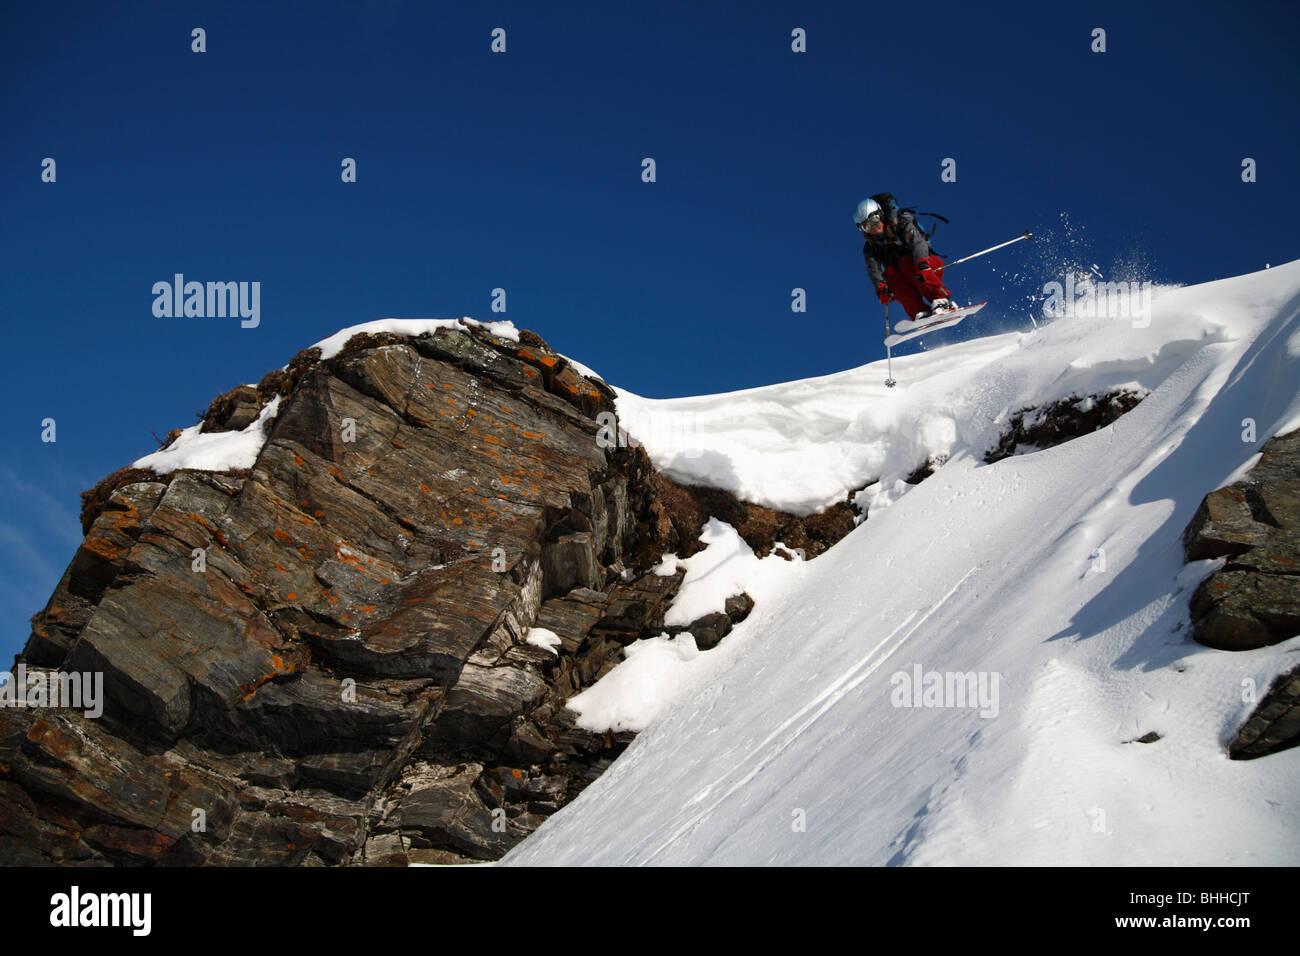 Skier going downhill, Abisko, Lapland, Sweden. - Stock Image